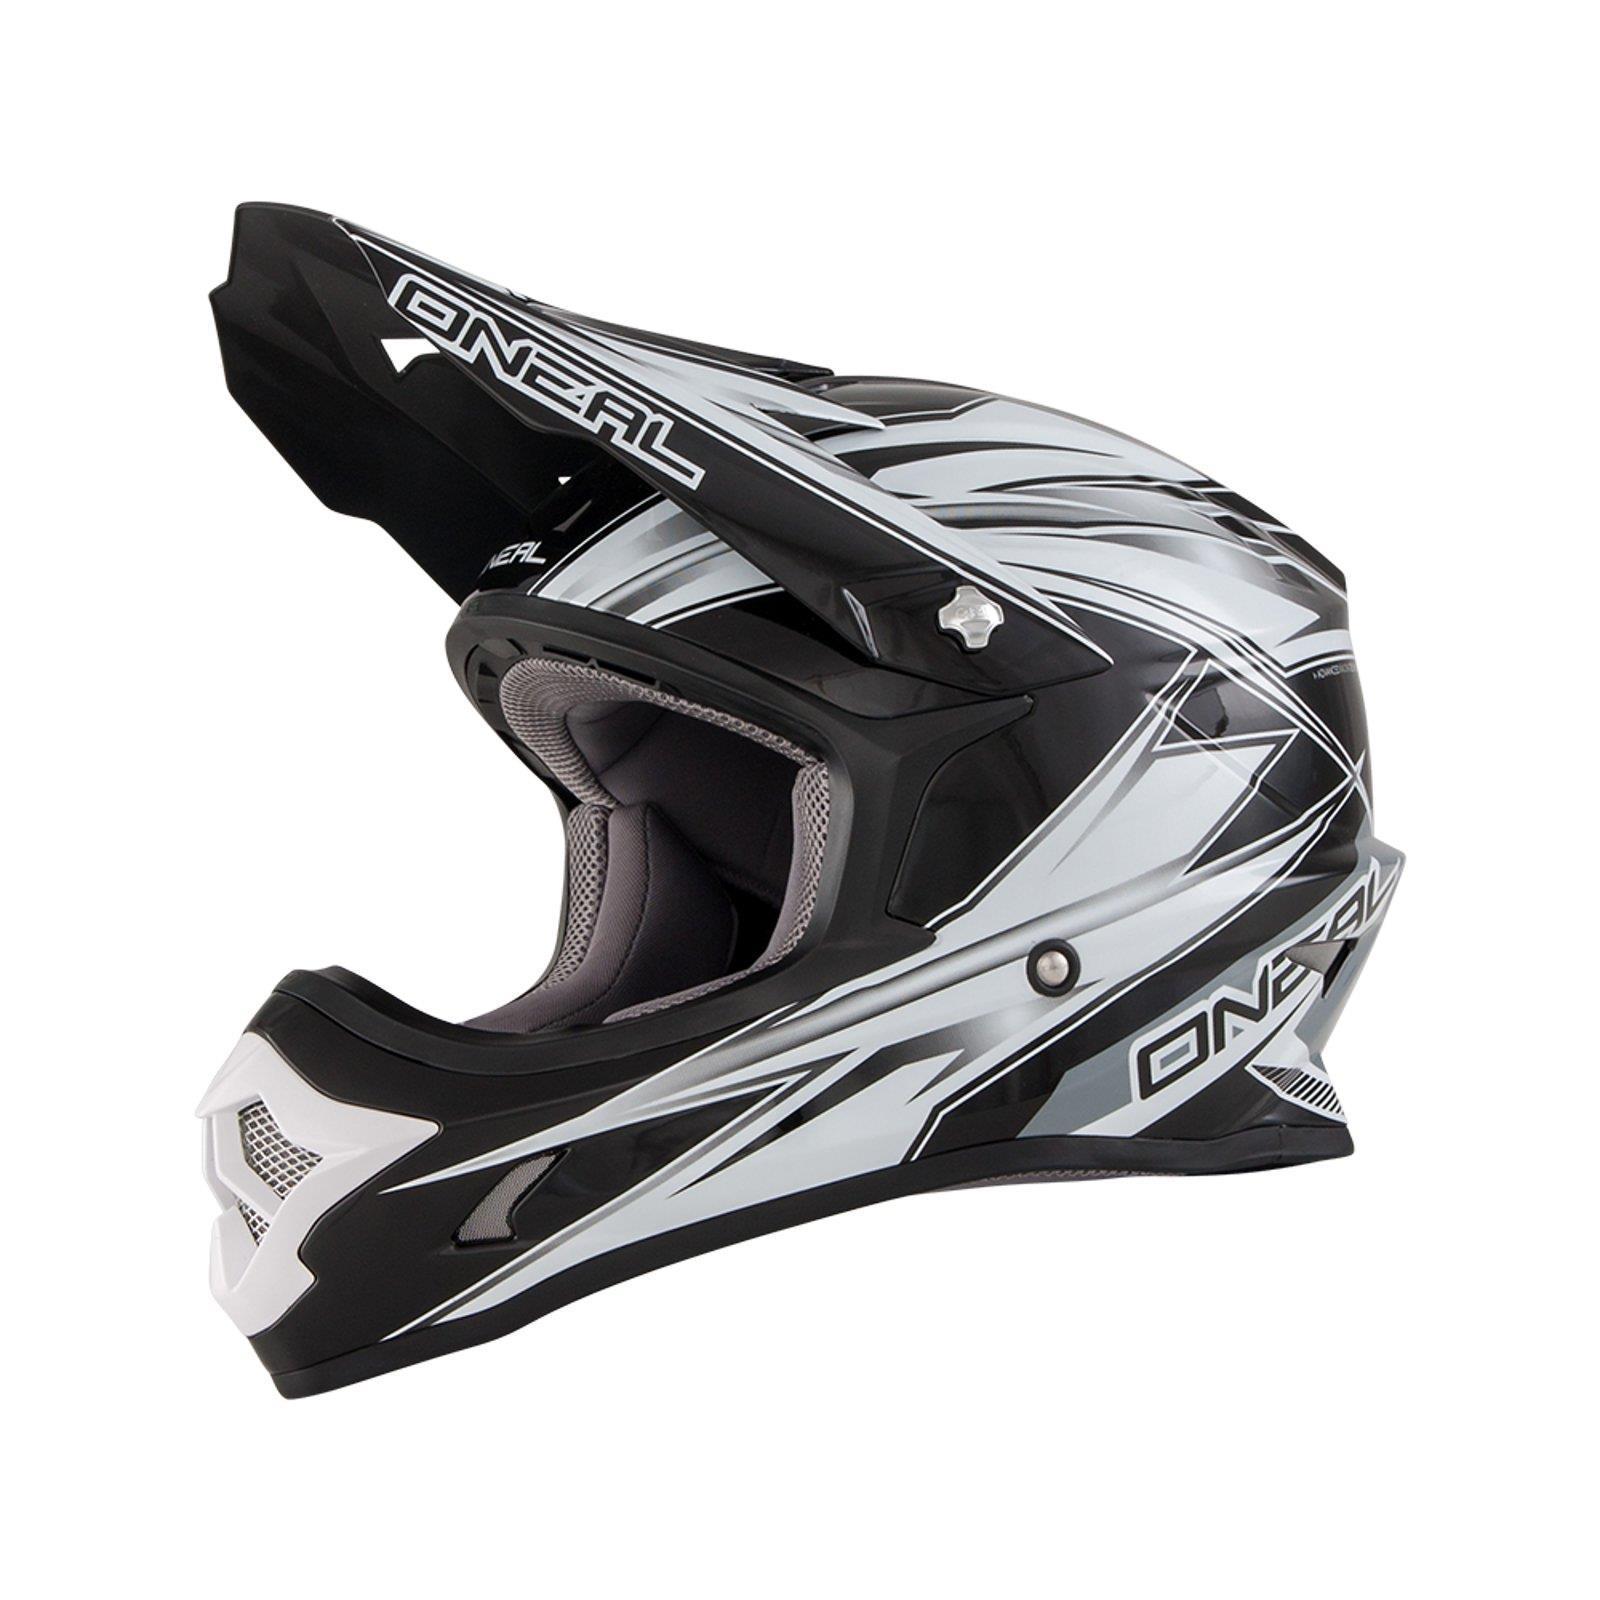 ONeal-Motocross-casco-MX-ENDURO-MOTO-BICI-FUORISTRADA-CROSS-Series-Adventure miniatura 115